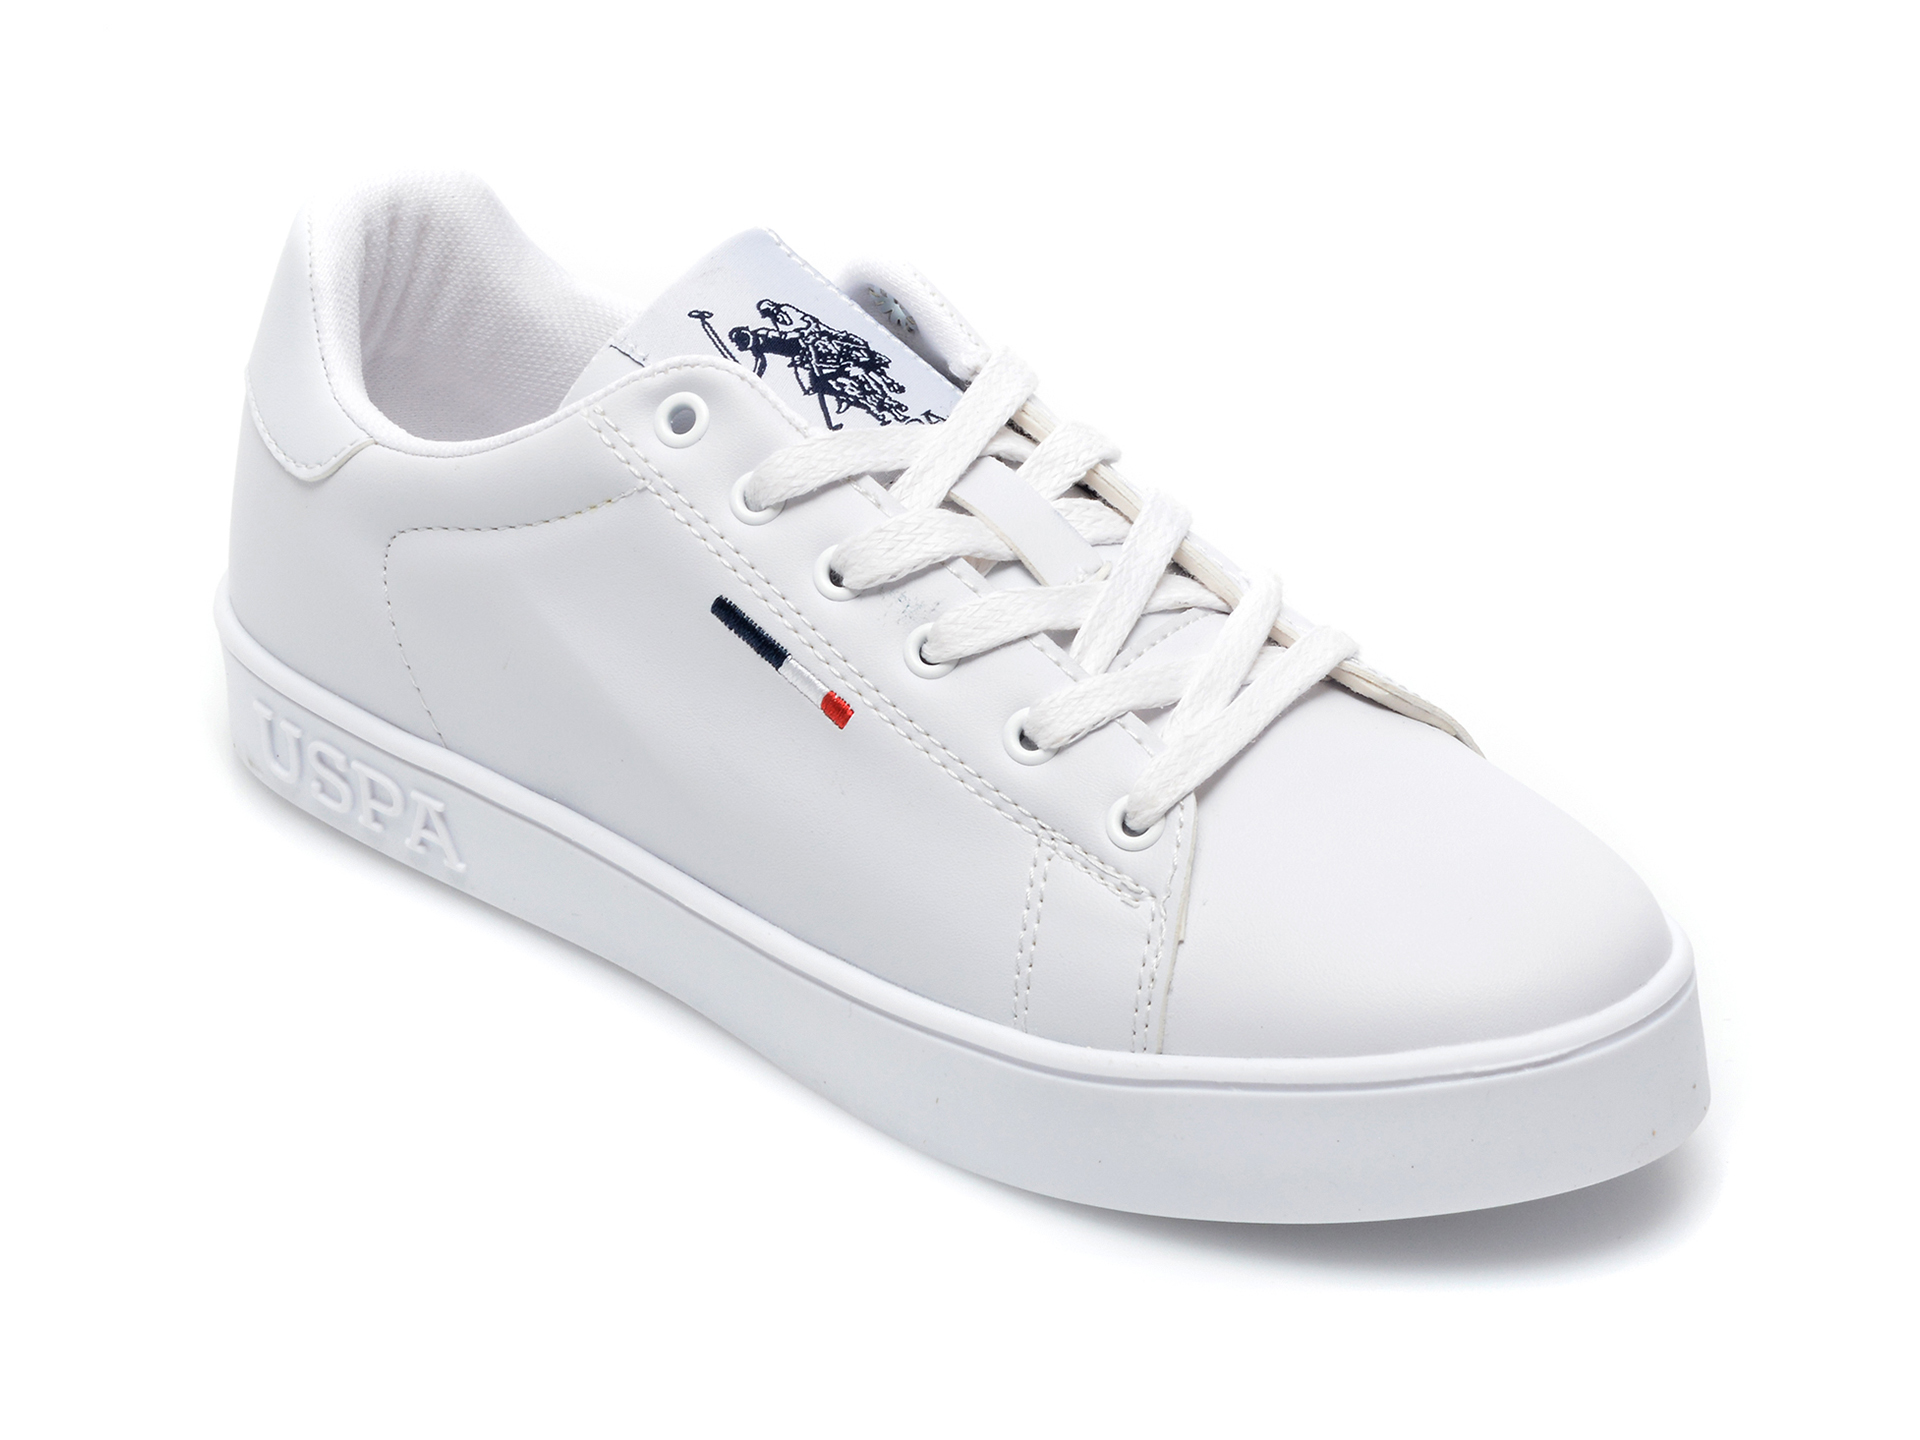 Pantofi Sport Us Polo Assn Albi, Flex1fx, Din Piele Ecologica